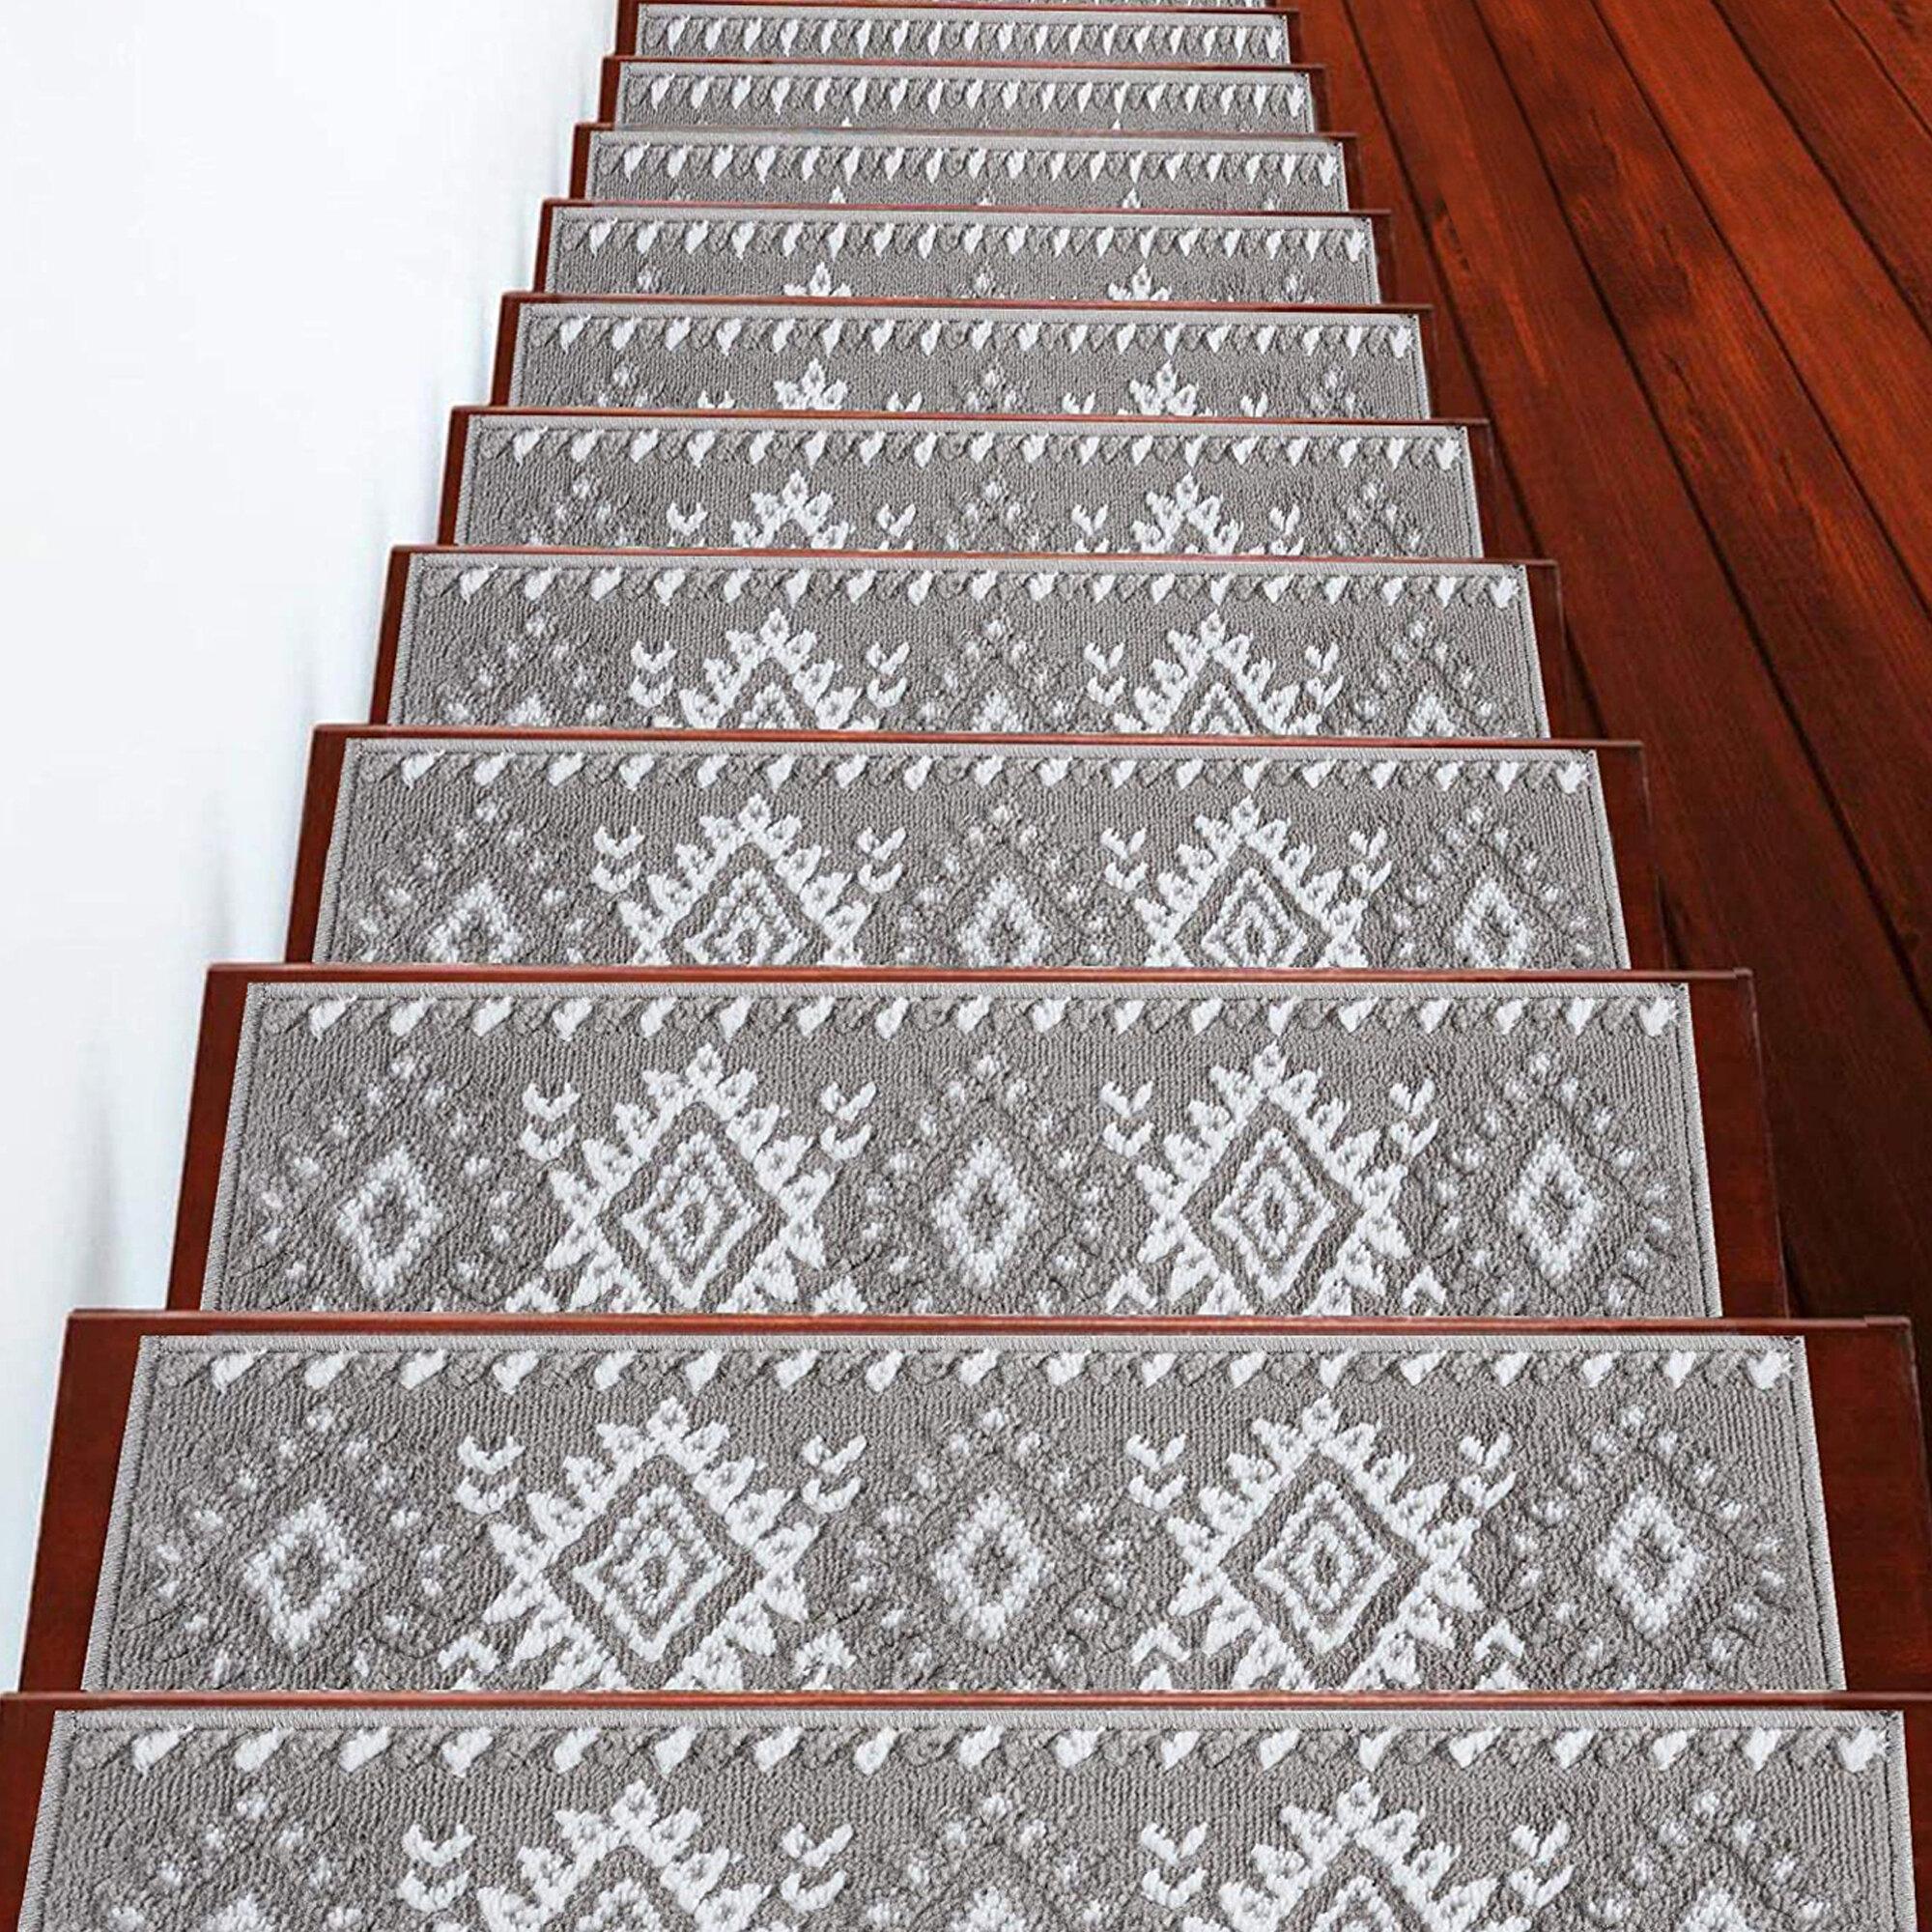 Union Rustic Ashbury Trellis Vibrant And Soft Stair Tread Reviews Wayfair